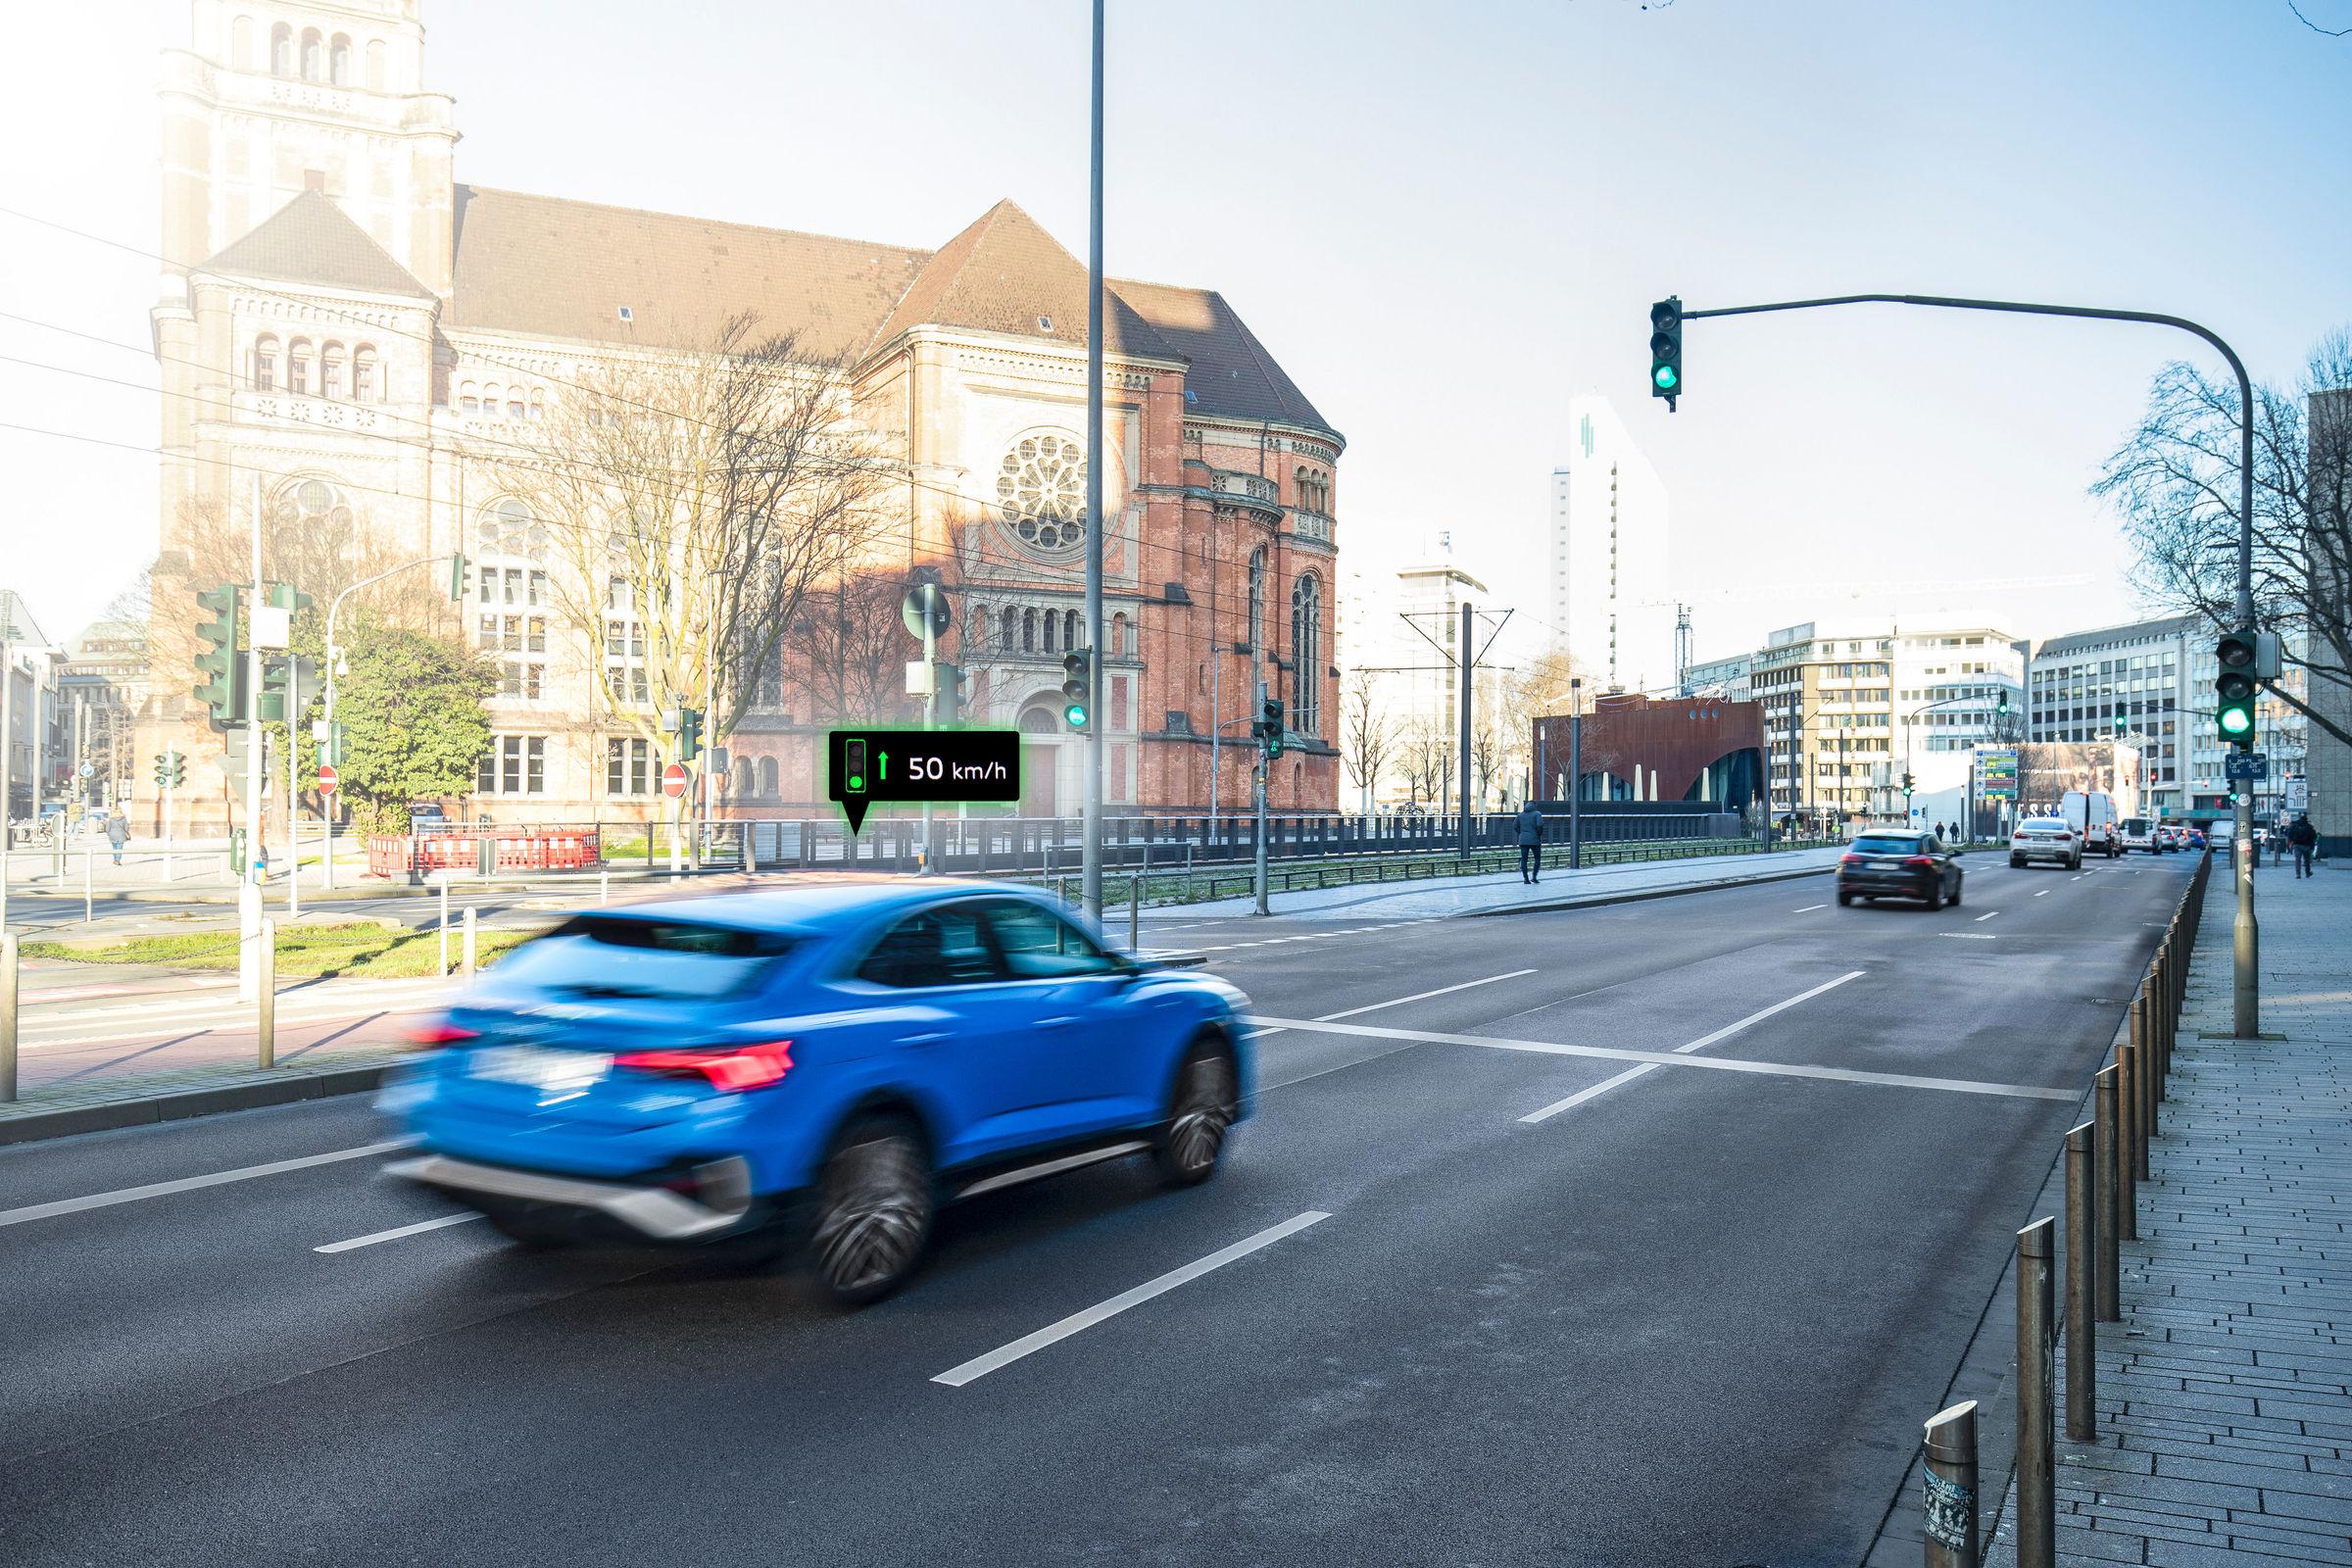 Audi networks with traffic lights in Düsseldorf - Image 7